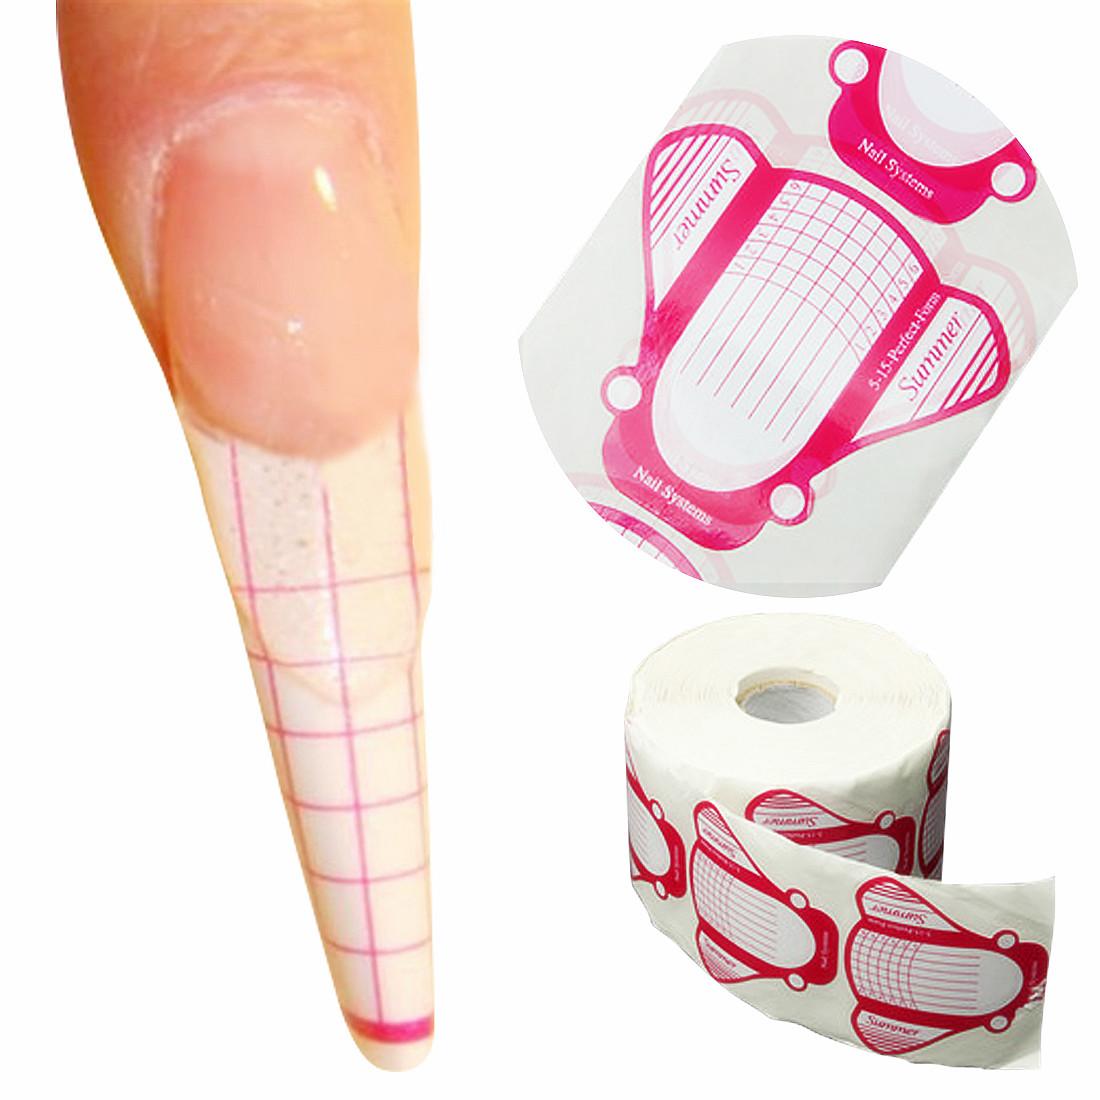 Pcs roll nail art uv gel extension self adhesive guide